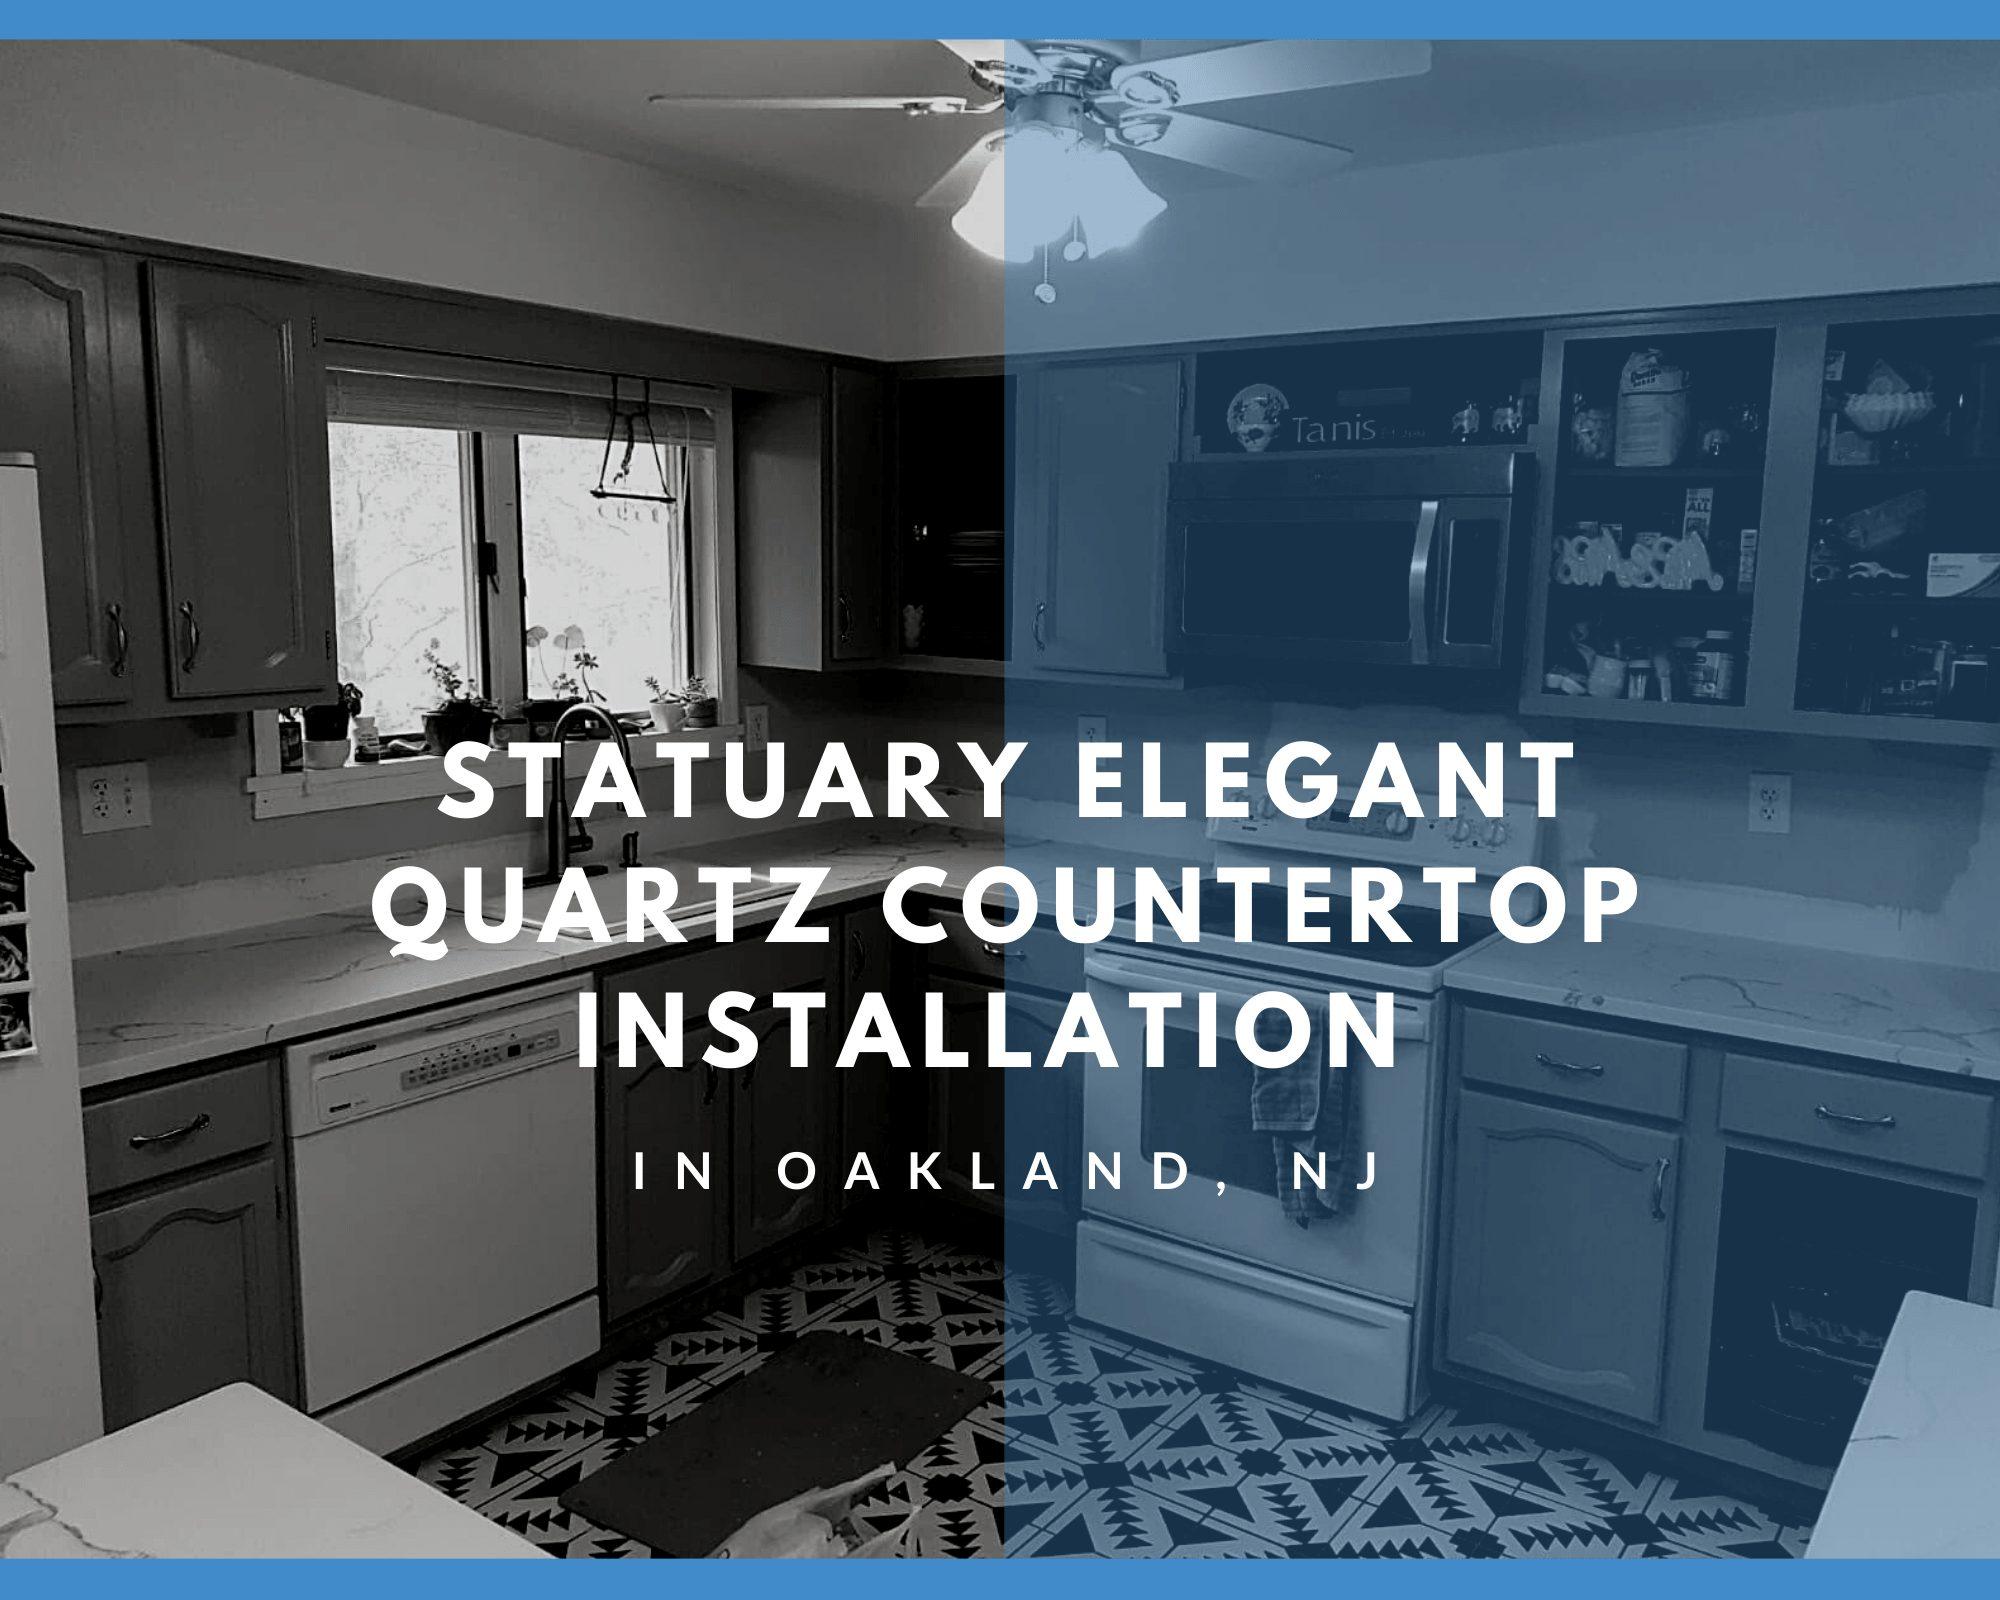 Statuary Elegant Quartz Countertop Installation in Oakland, NJ